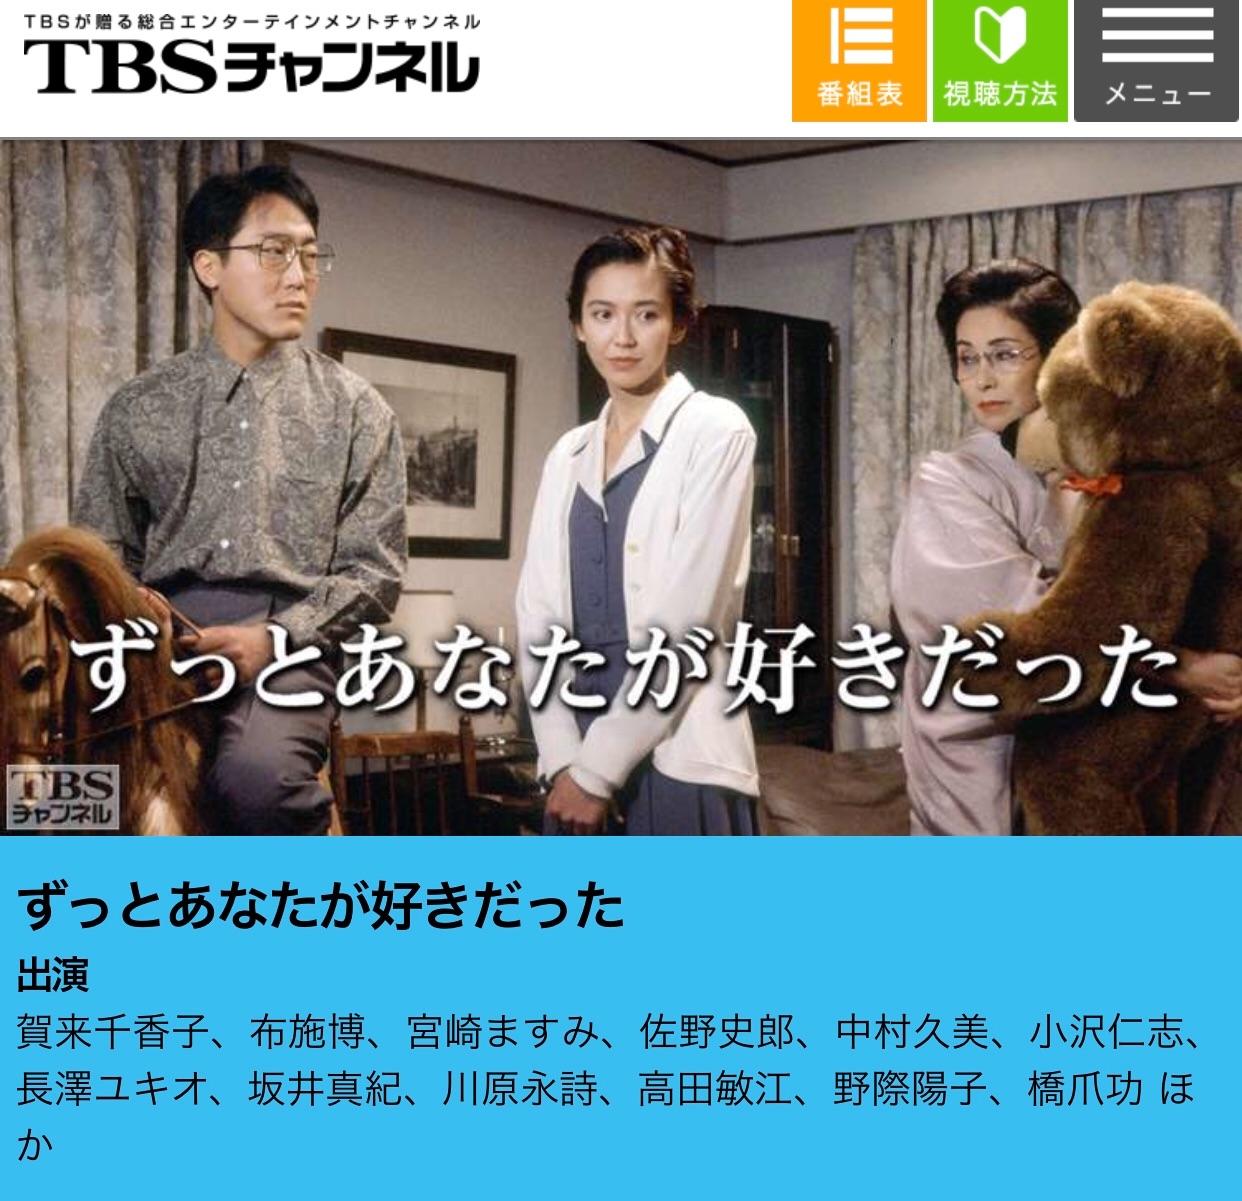 f:id:masanori-kato1972:20190829195910j:image